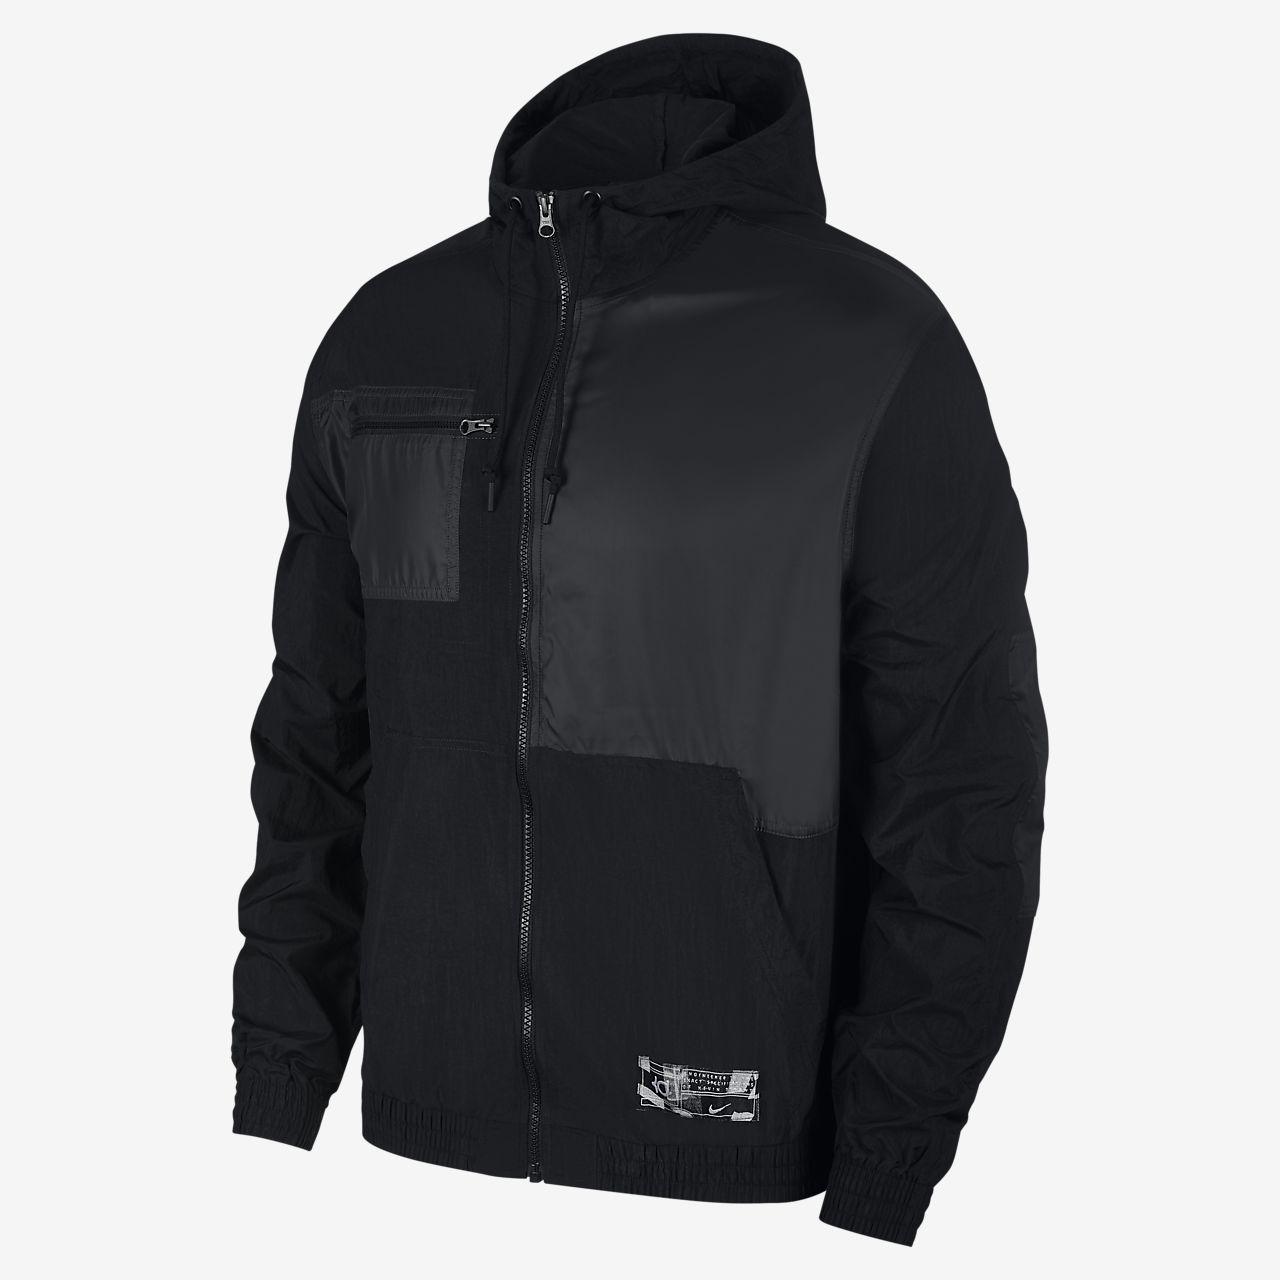 47395d46be KD Men s Basketball Jacket. Nike.com SG